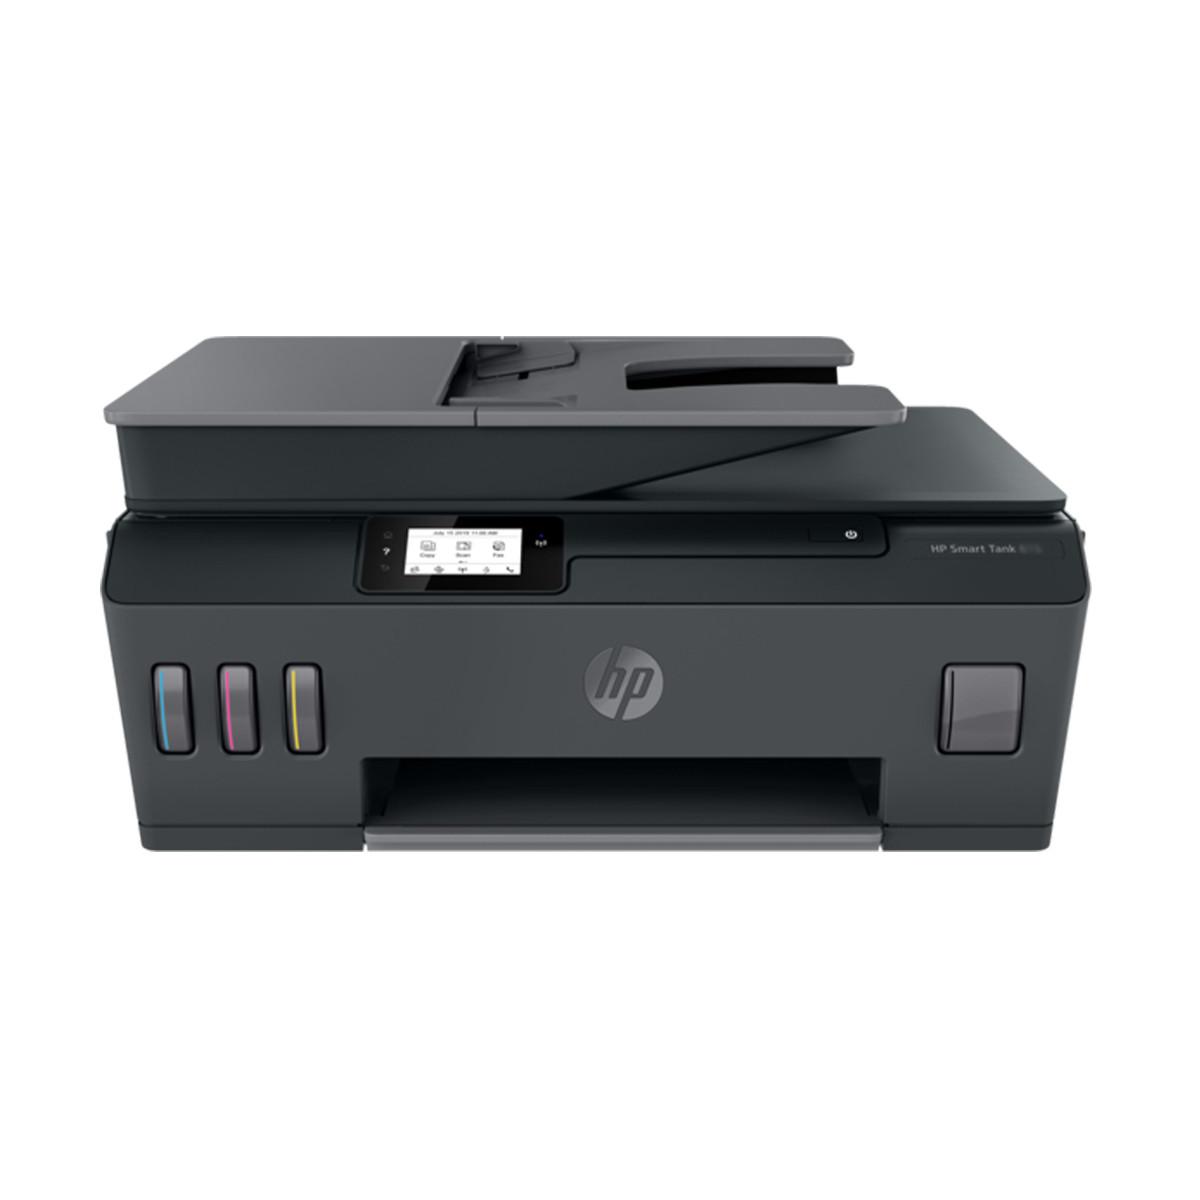 Impressora HP Smart Tank 532 Multifuncional com Wireless